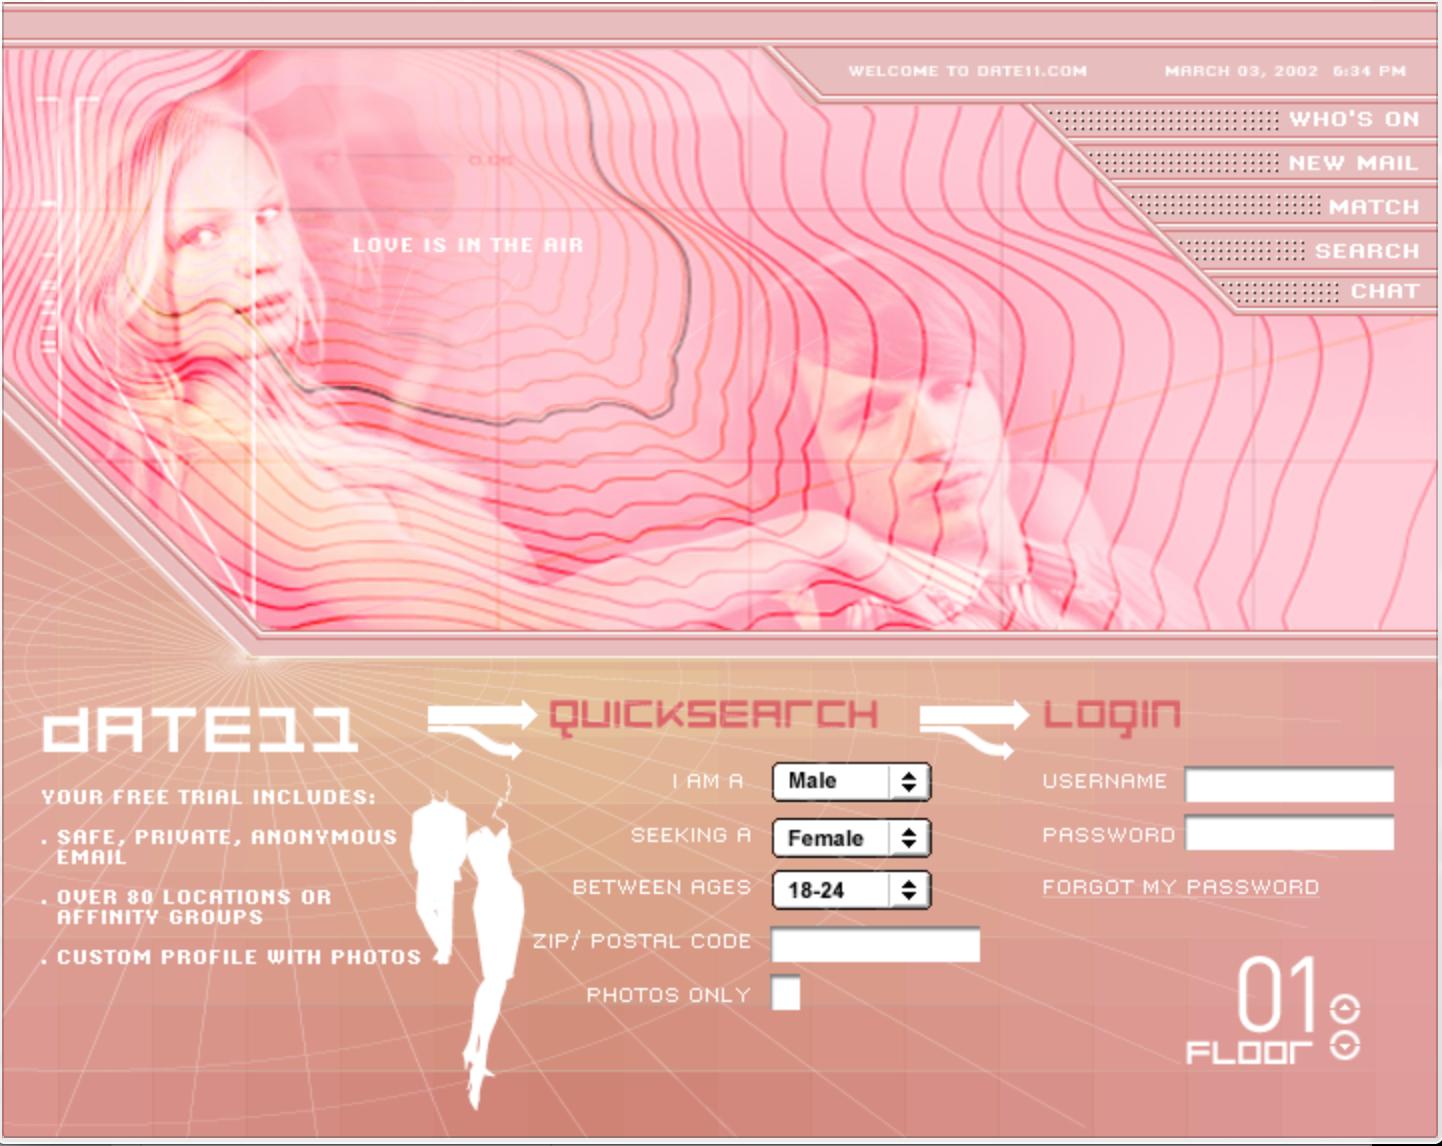 DATE 11 Web Design